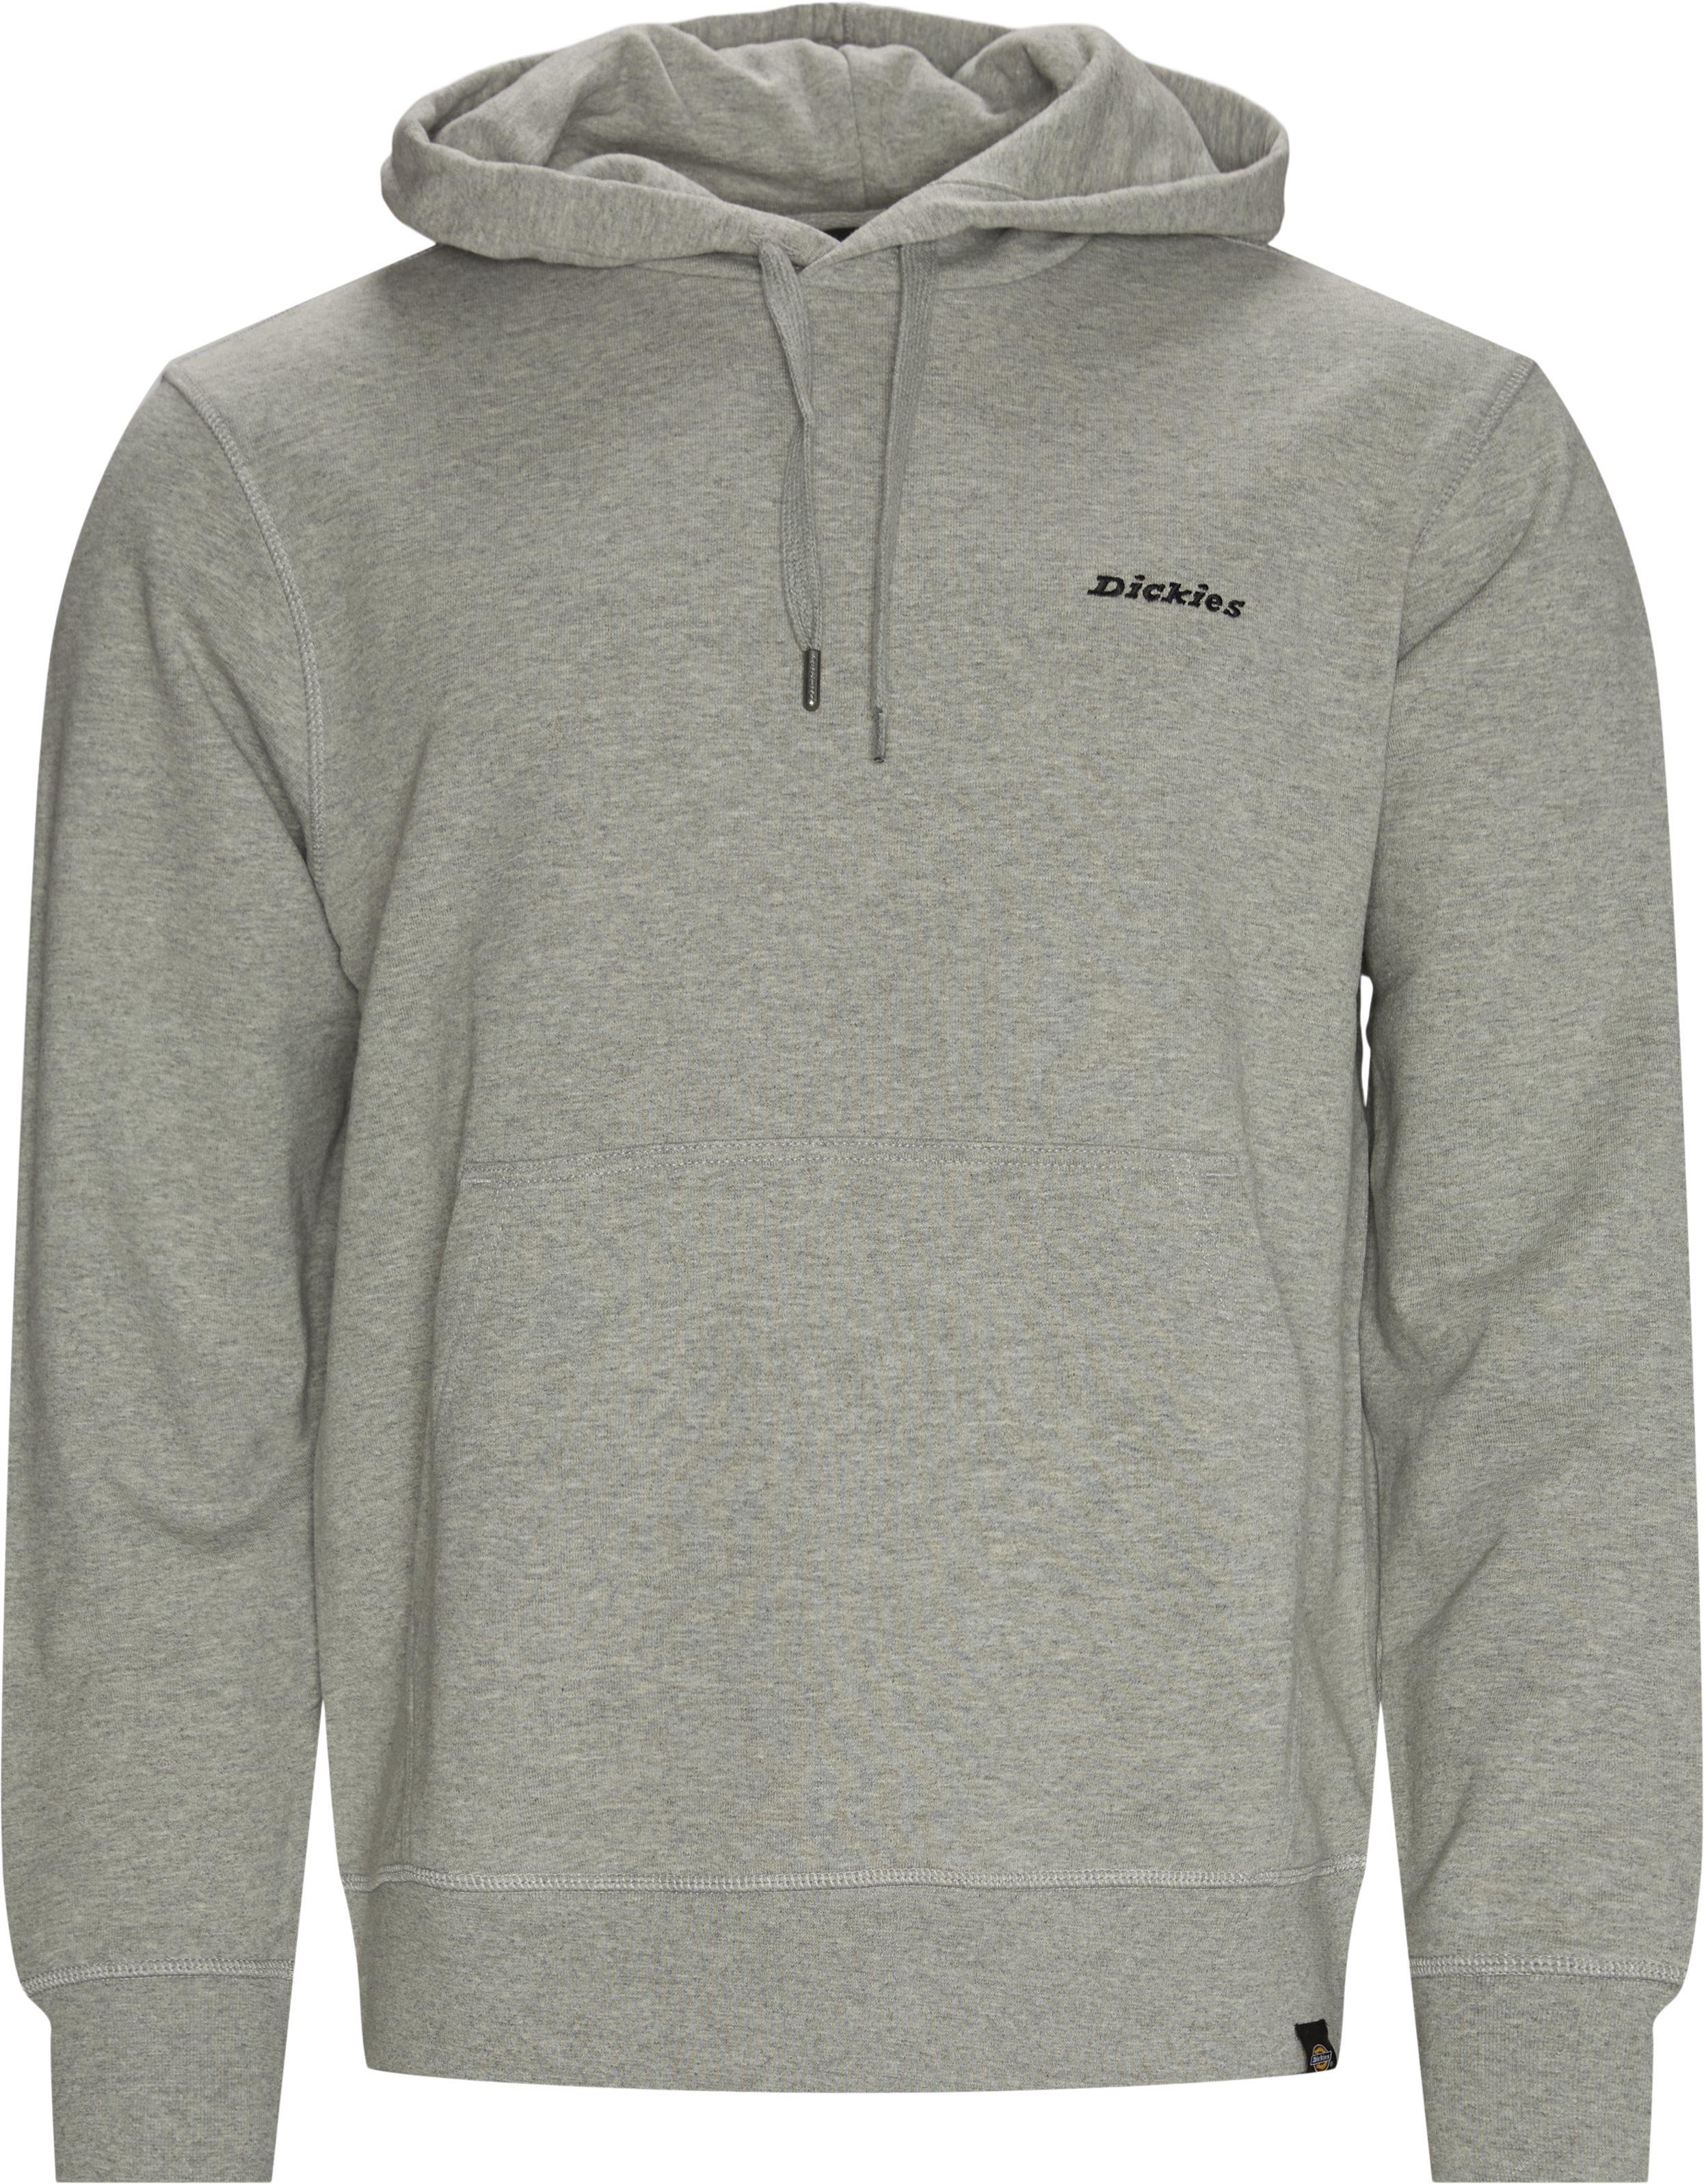 Loretto Hood Sweatshirt - Sweatshirts - Regular fit - Grå